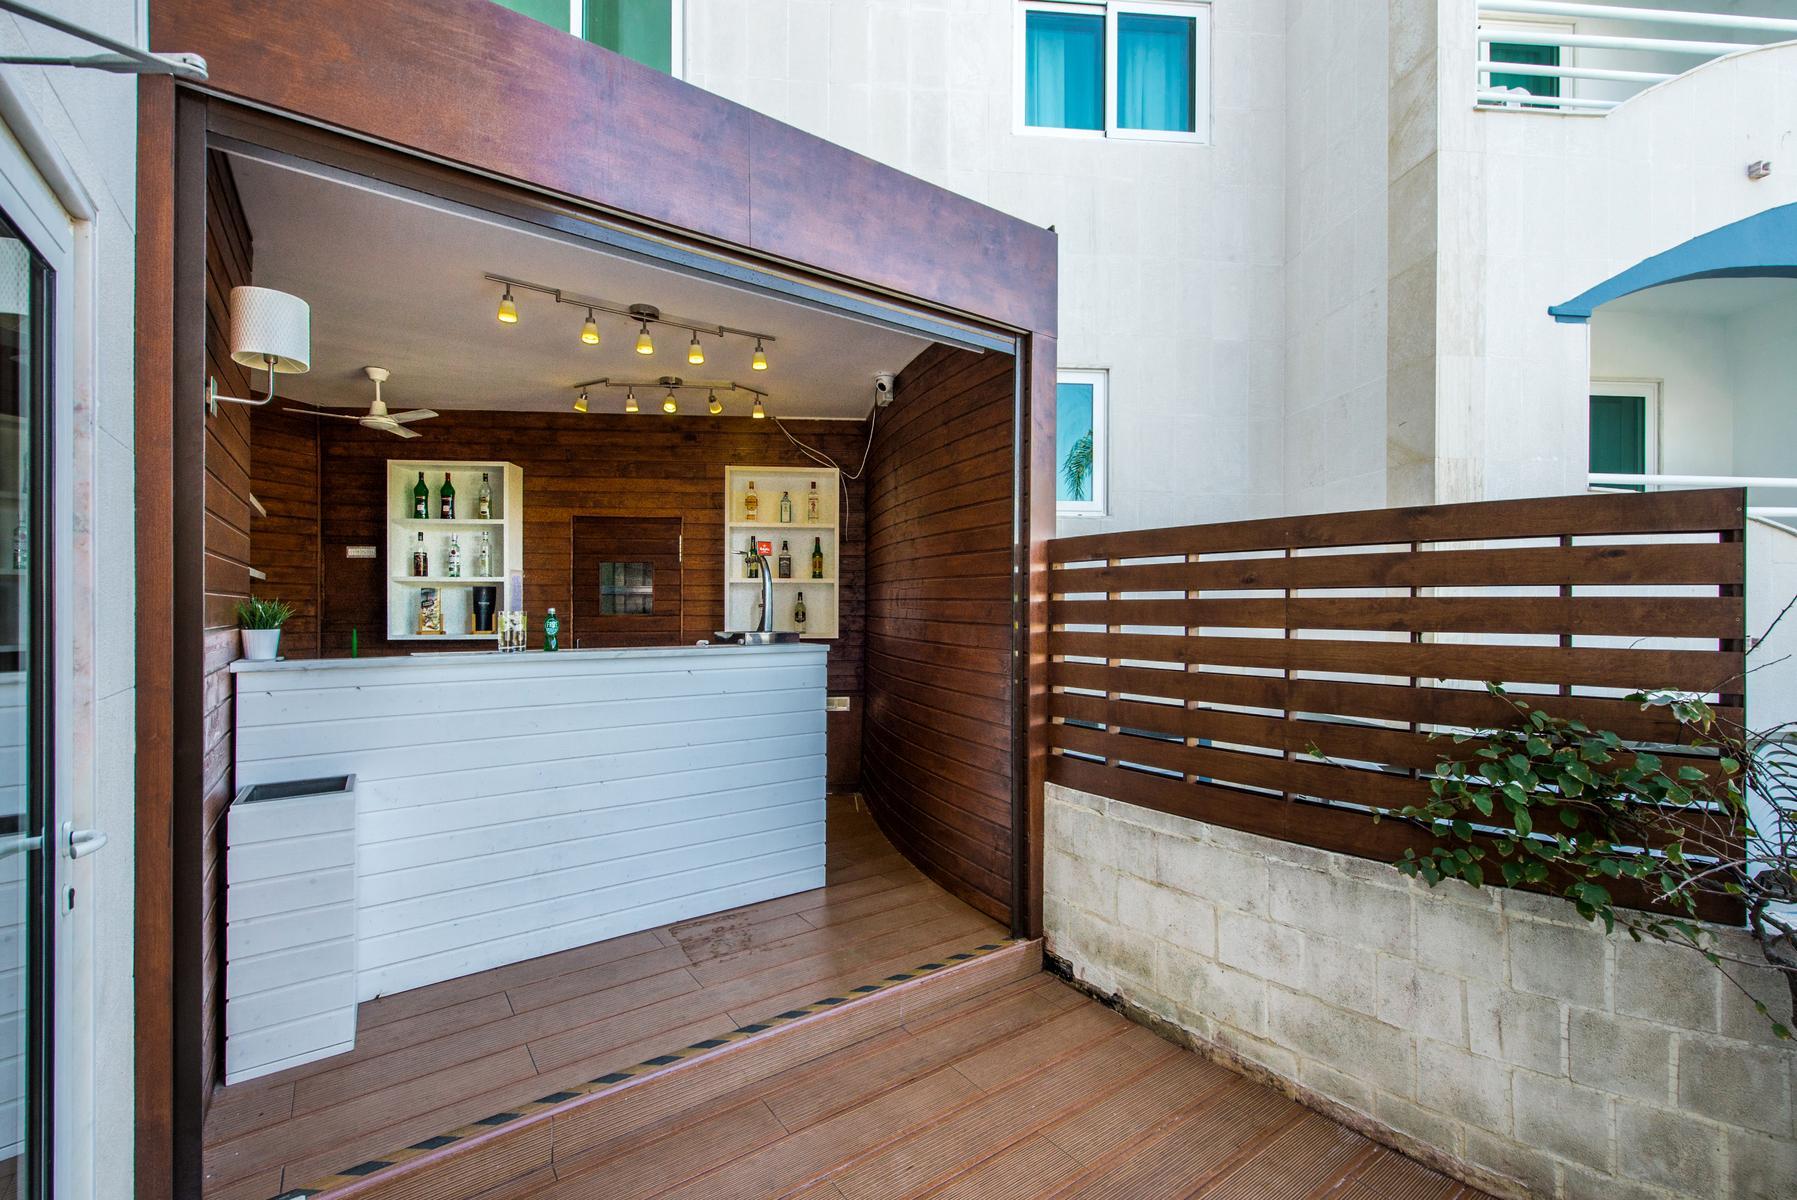 Velamar budget boutique hotel in albufeira portugal for Hip hotels budget